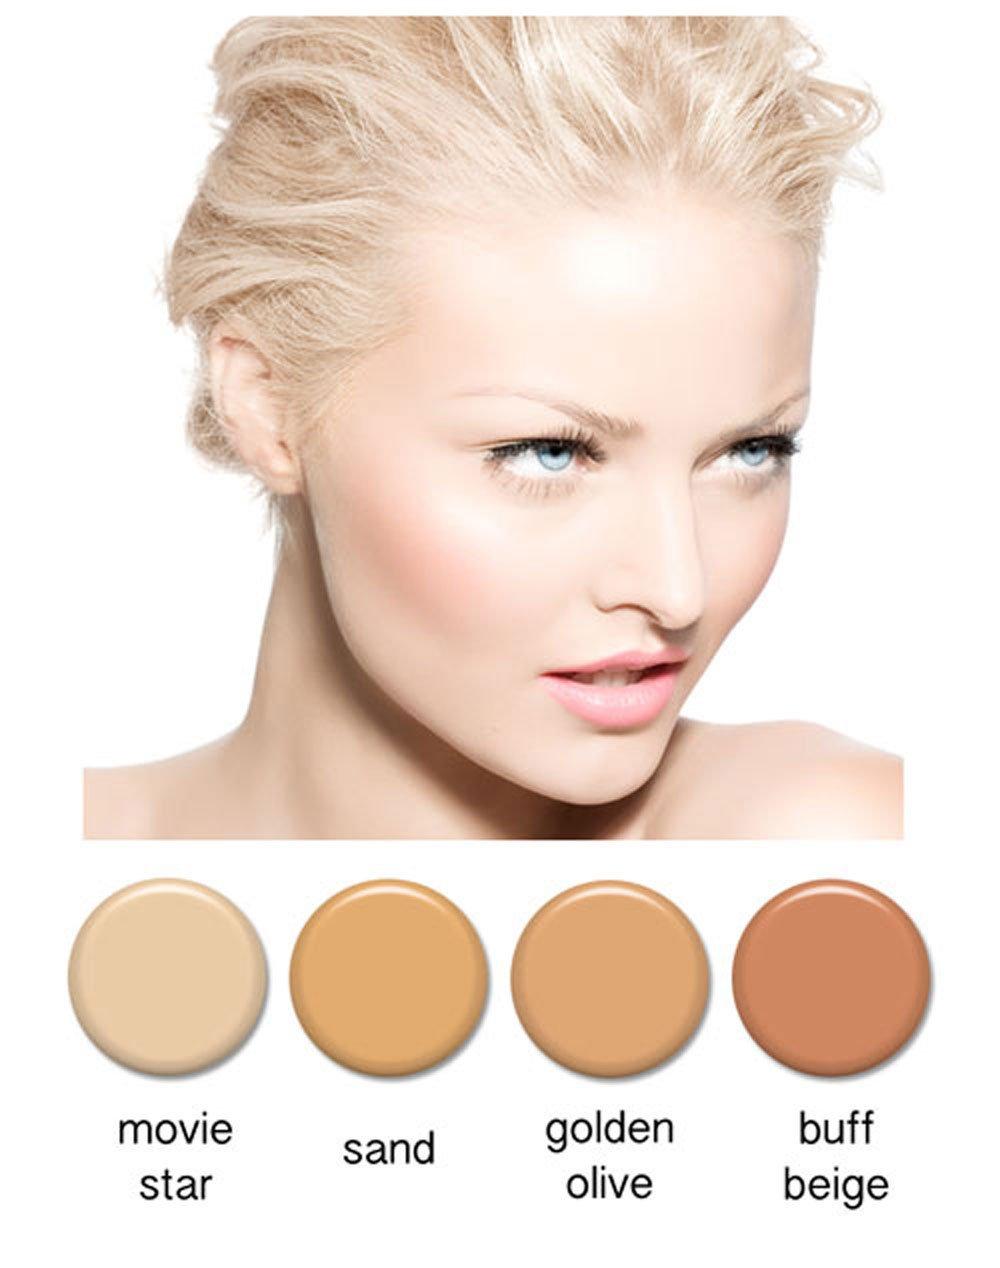 Art of Air 4pc FAIR Complexion Professional Airbrush Cosmetic Makeup Set 1/2 oz bottles